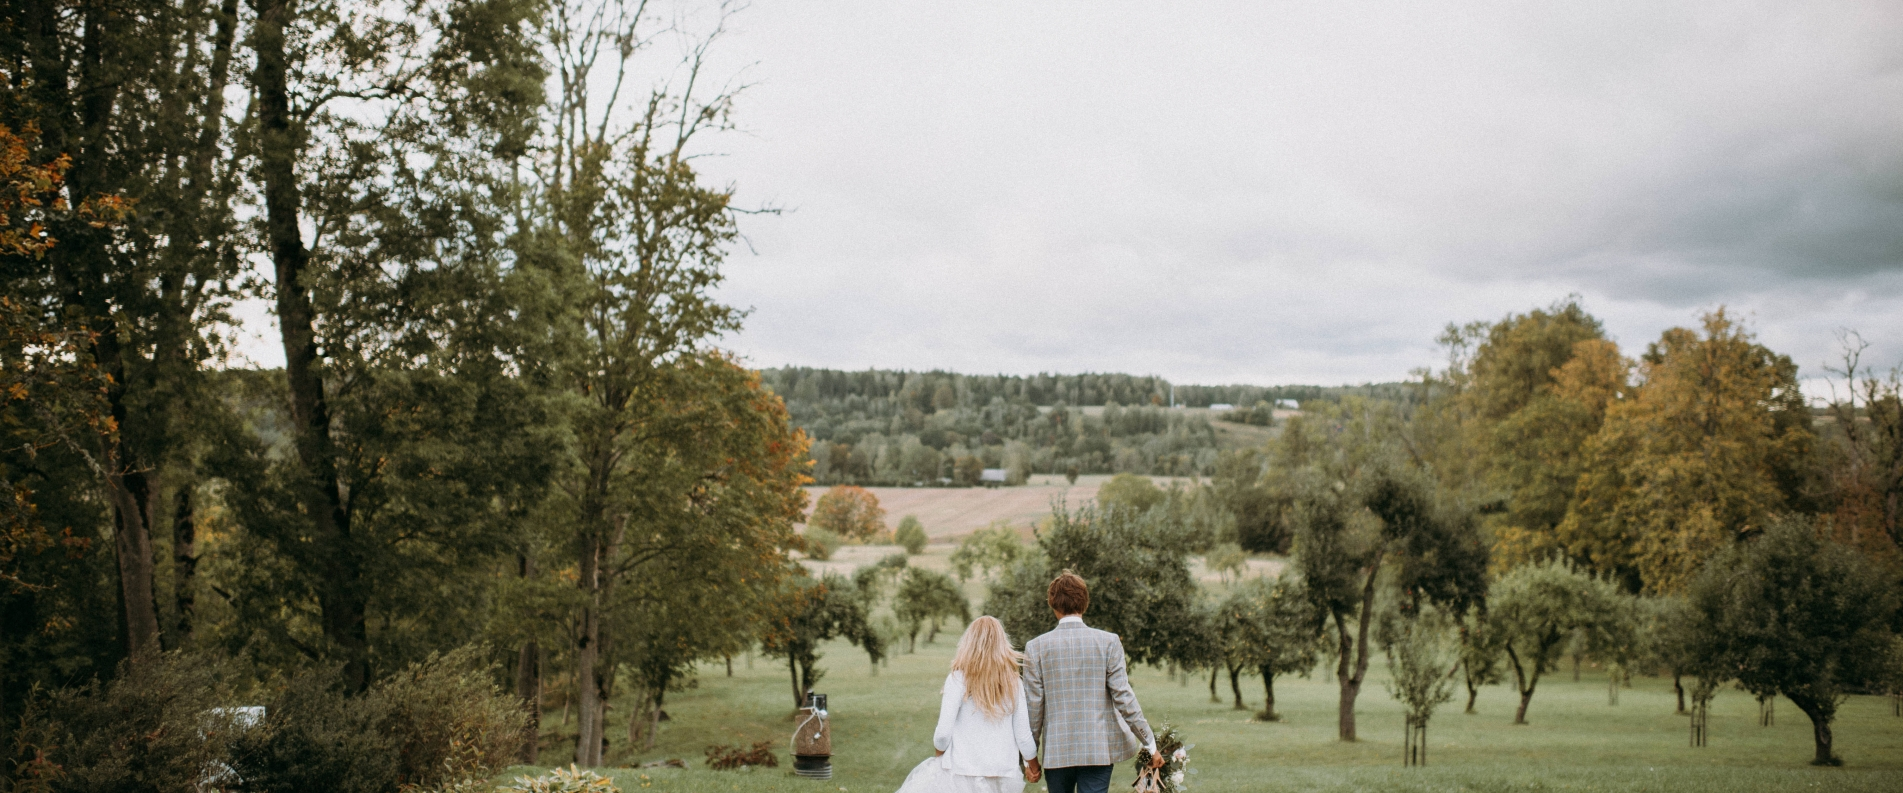 dace-haralds-by-miks-sels-weddings-623_3420-bad6a4b252379c4bf0f93acf146fe0ac.jpg